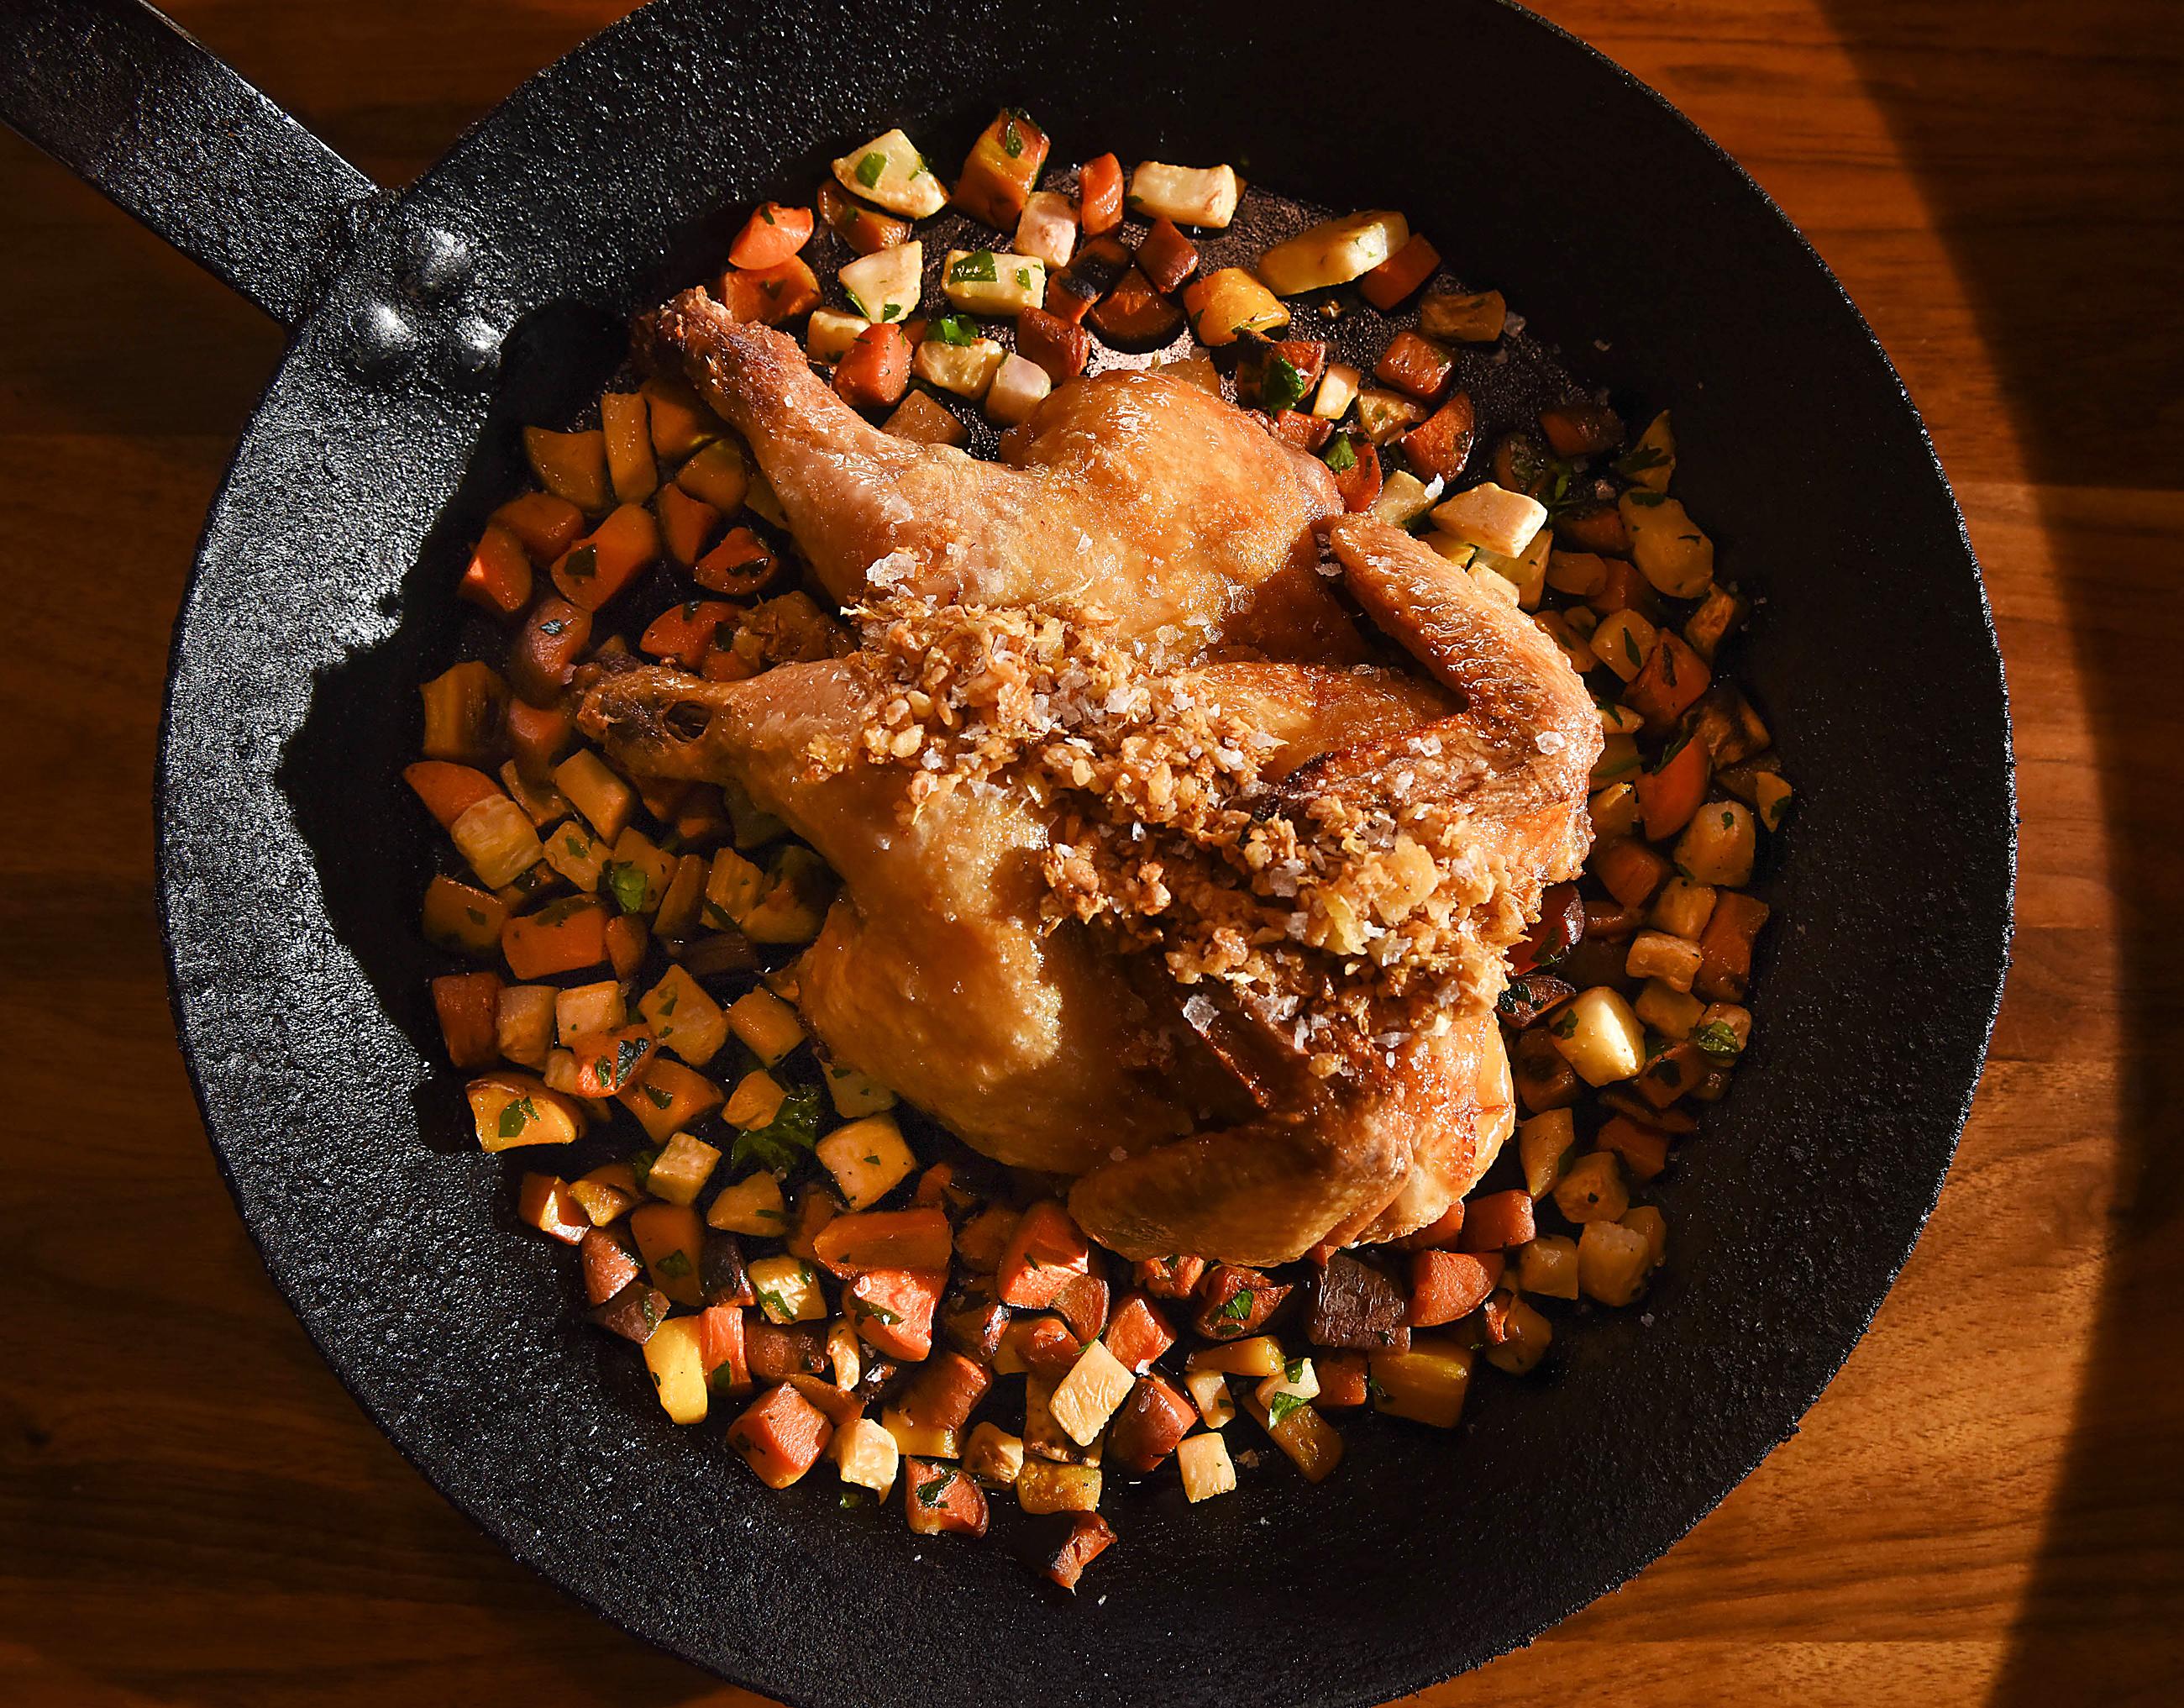 20170207smVivo-4-3 Crispy whole chicken with fried garlic at Vivo Kitchen in Sewickley.